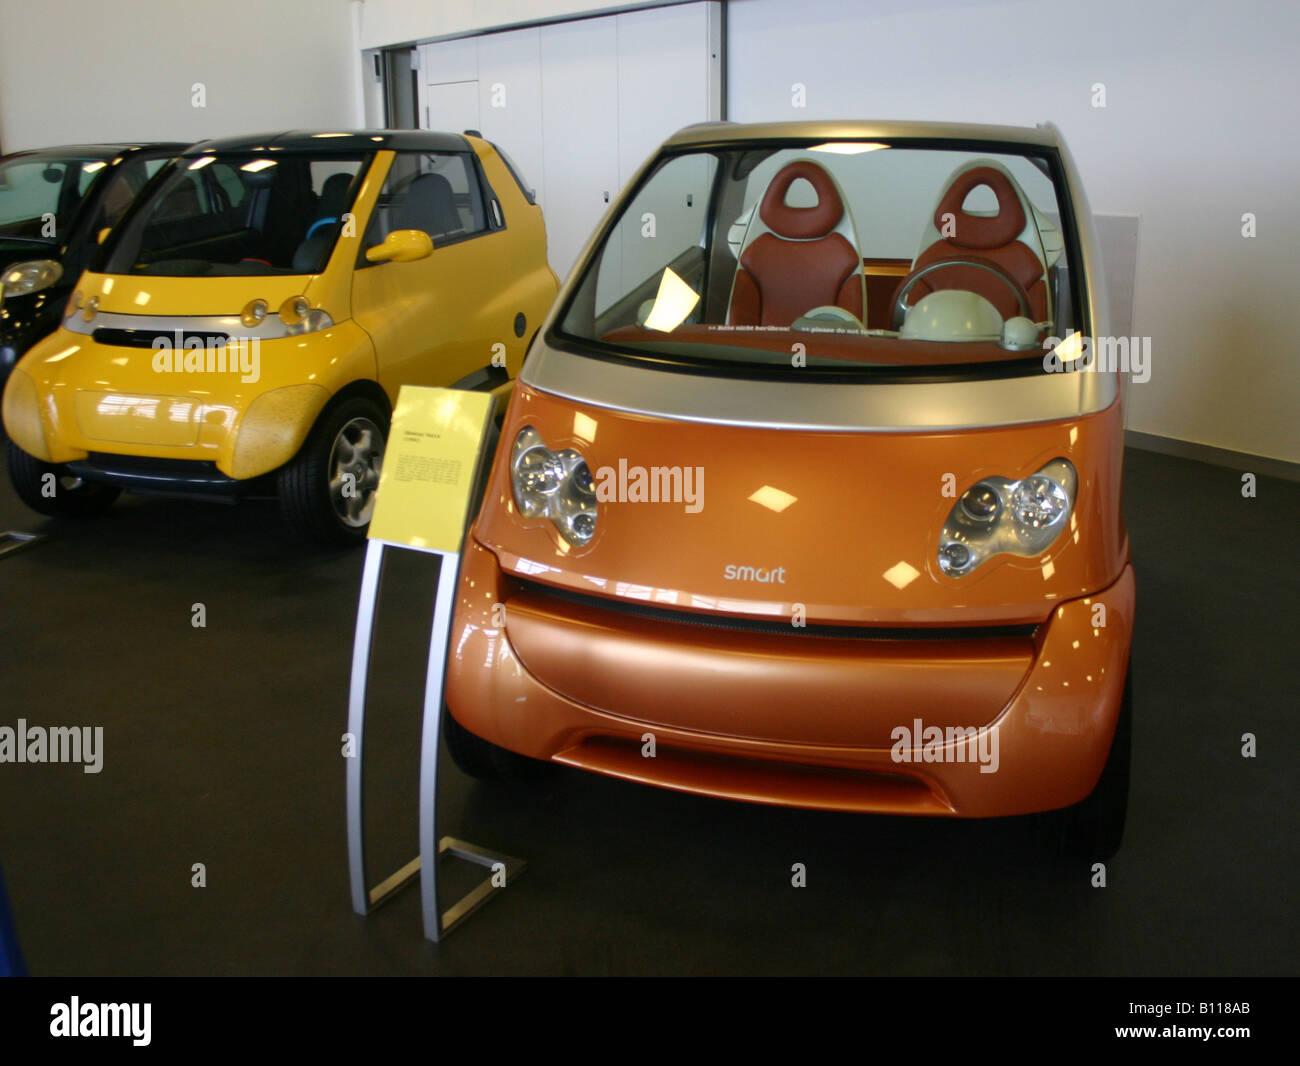 Smart Cars Stock Photos & Smart Cars Stock Images - Alamy